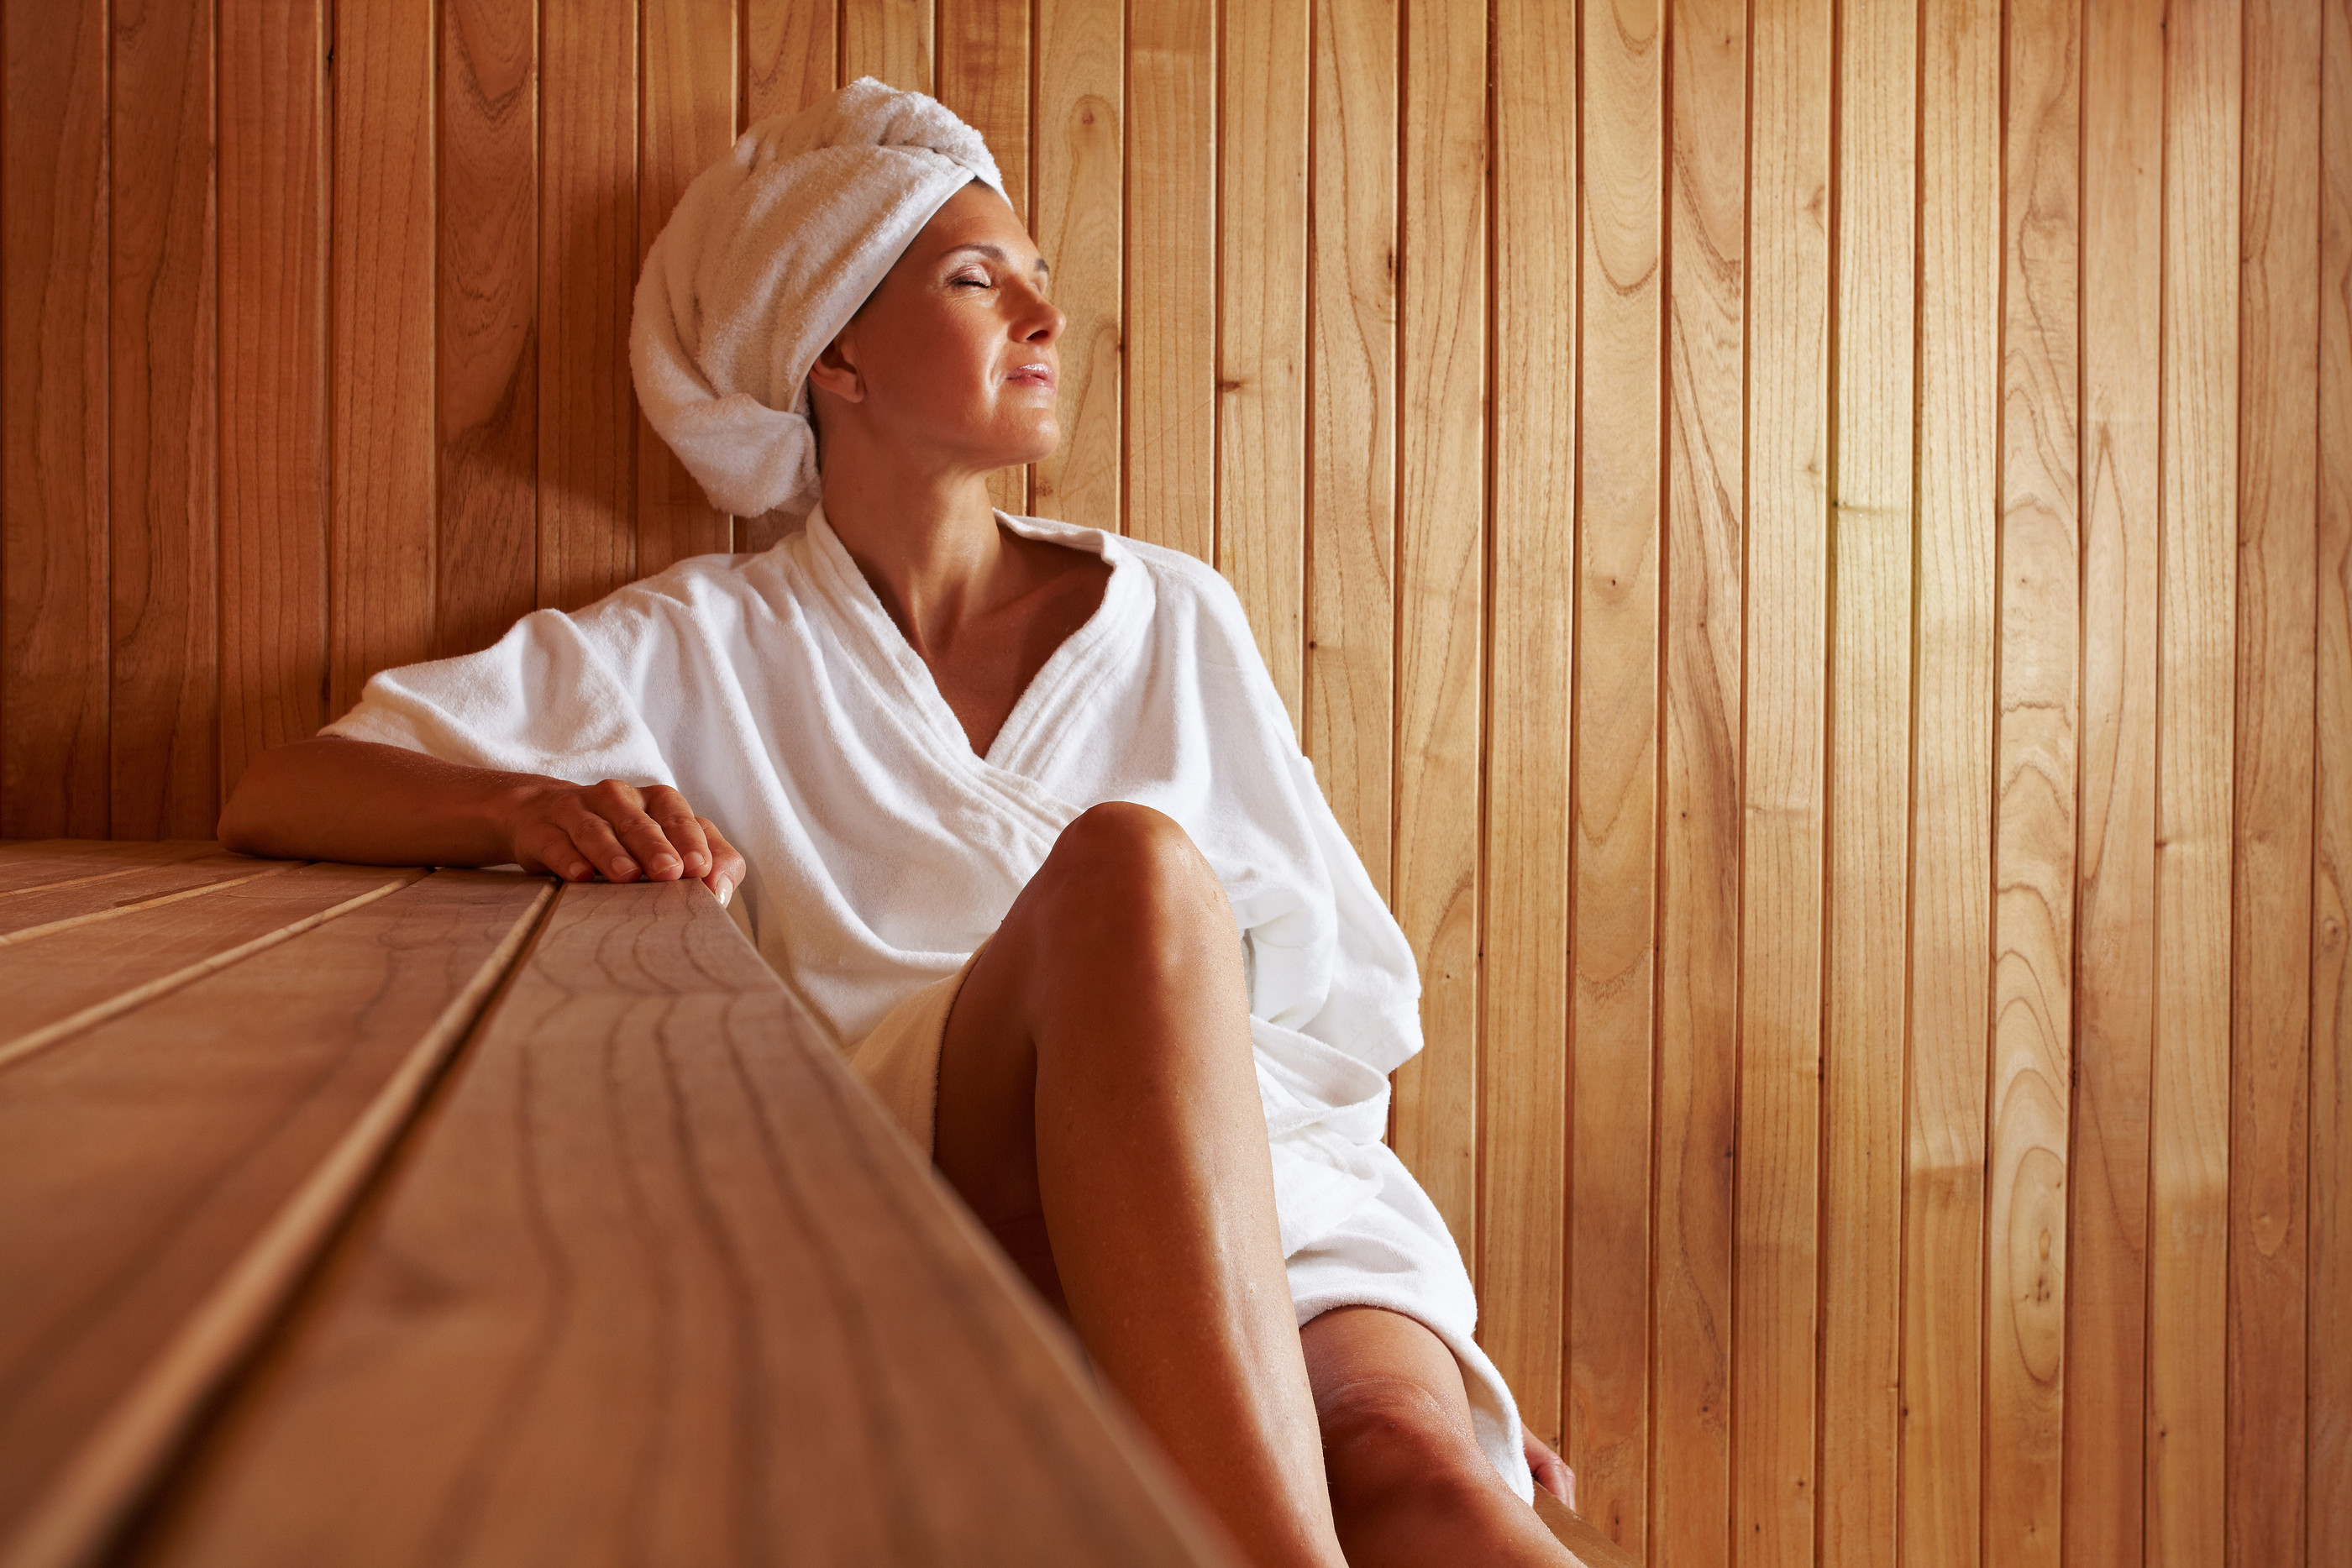 bigstock-Elderly-woman-sitting-sauna-33696371